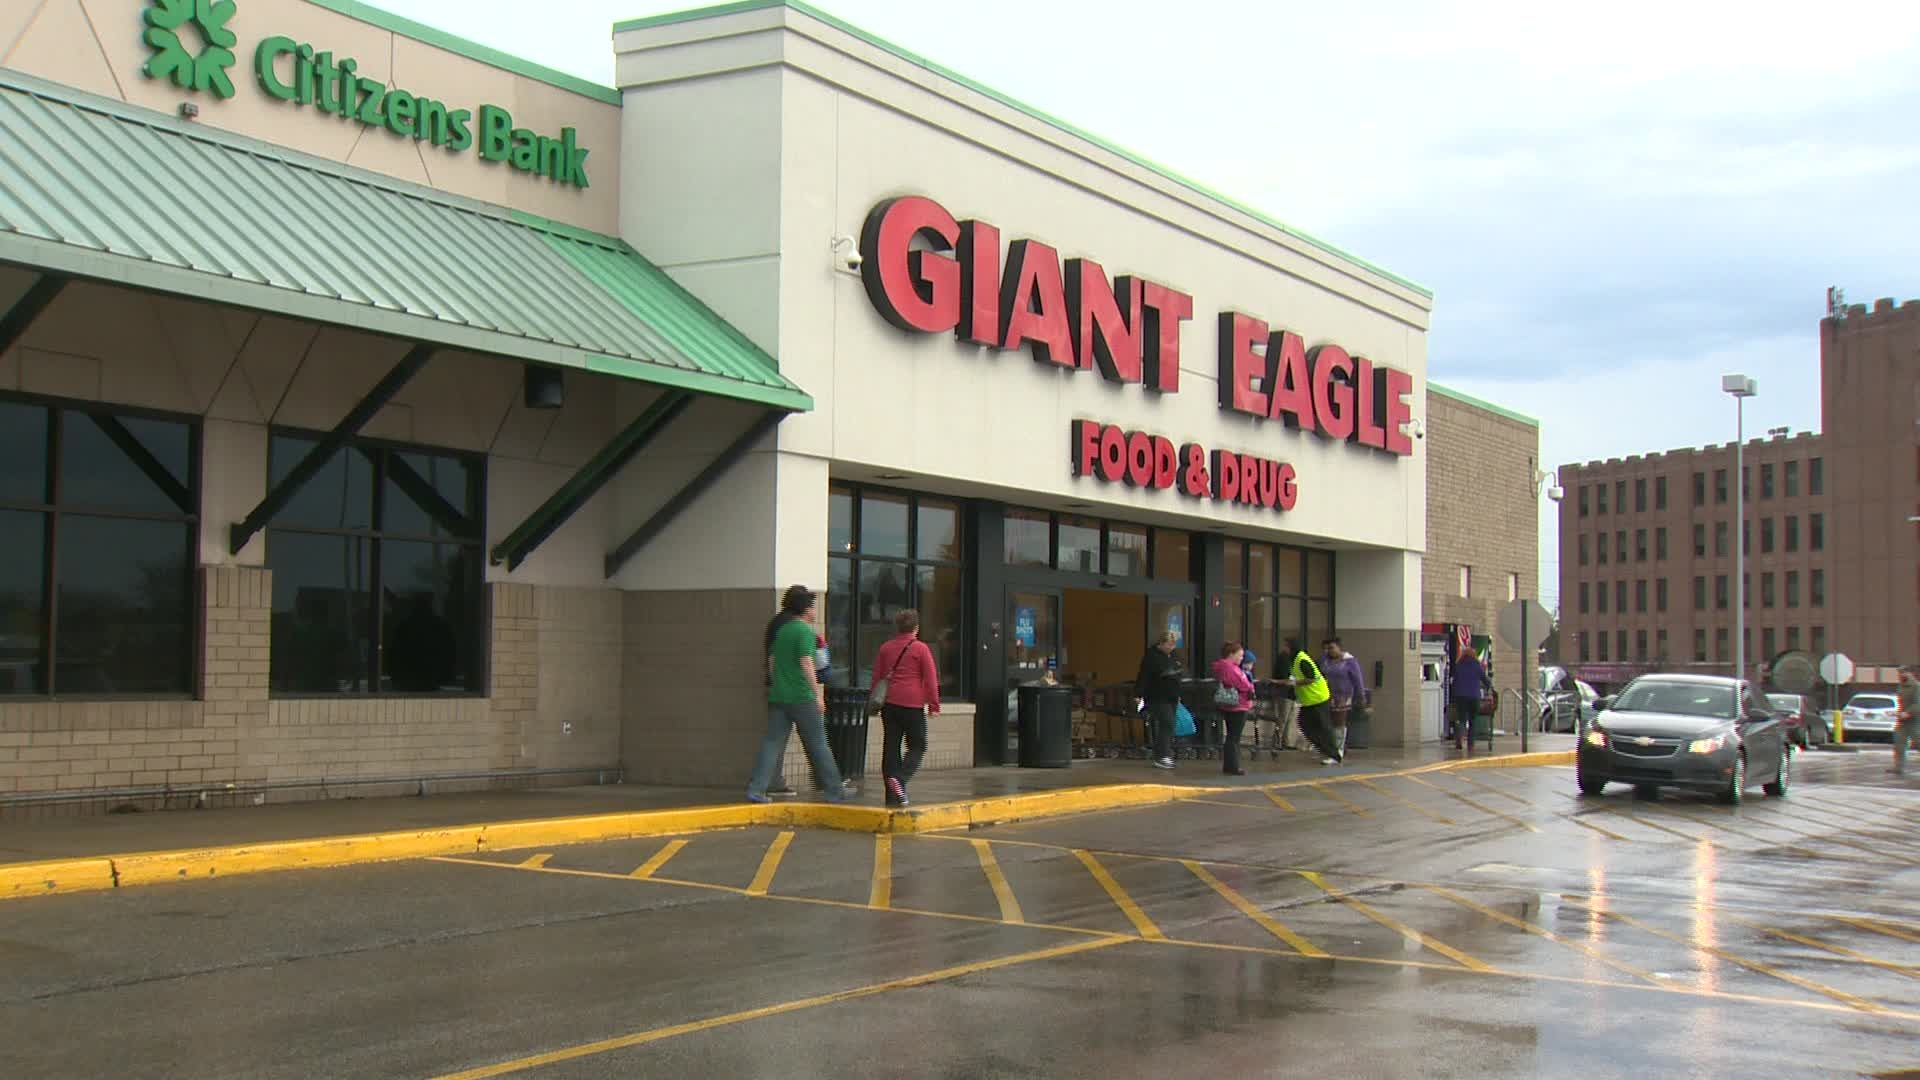 Gaint Eagle hours,Gaint Eagle near me, Gaint Eagle Pharmacy hours, Gaint Eagle holiday hours, Gaint Eagle locations